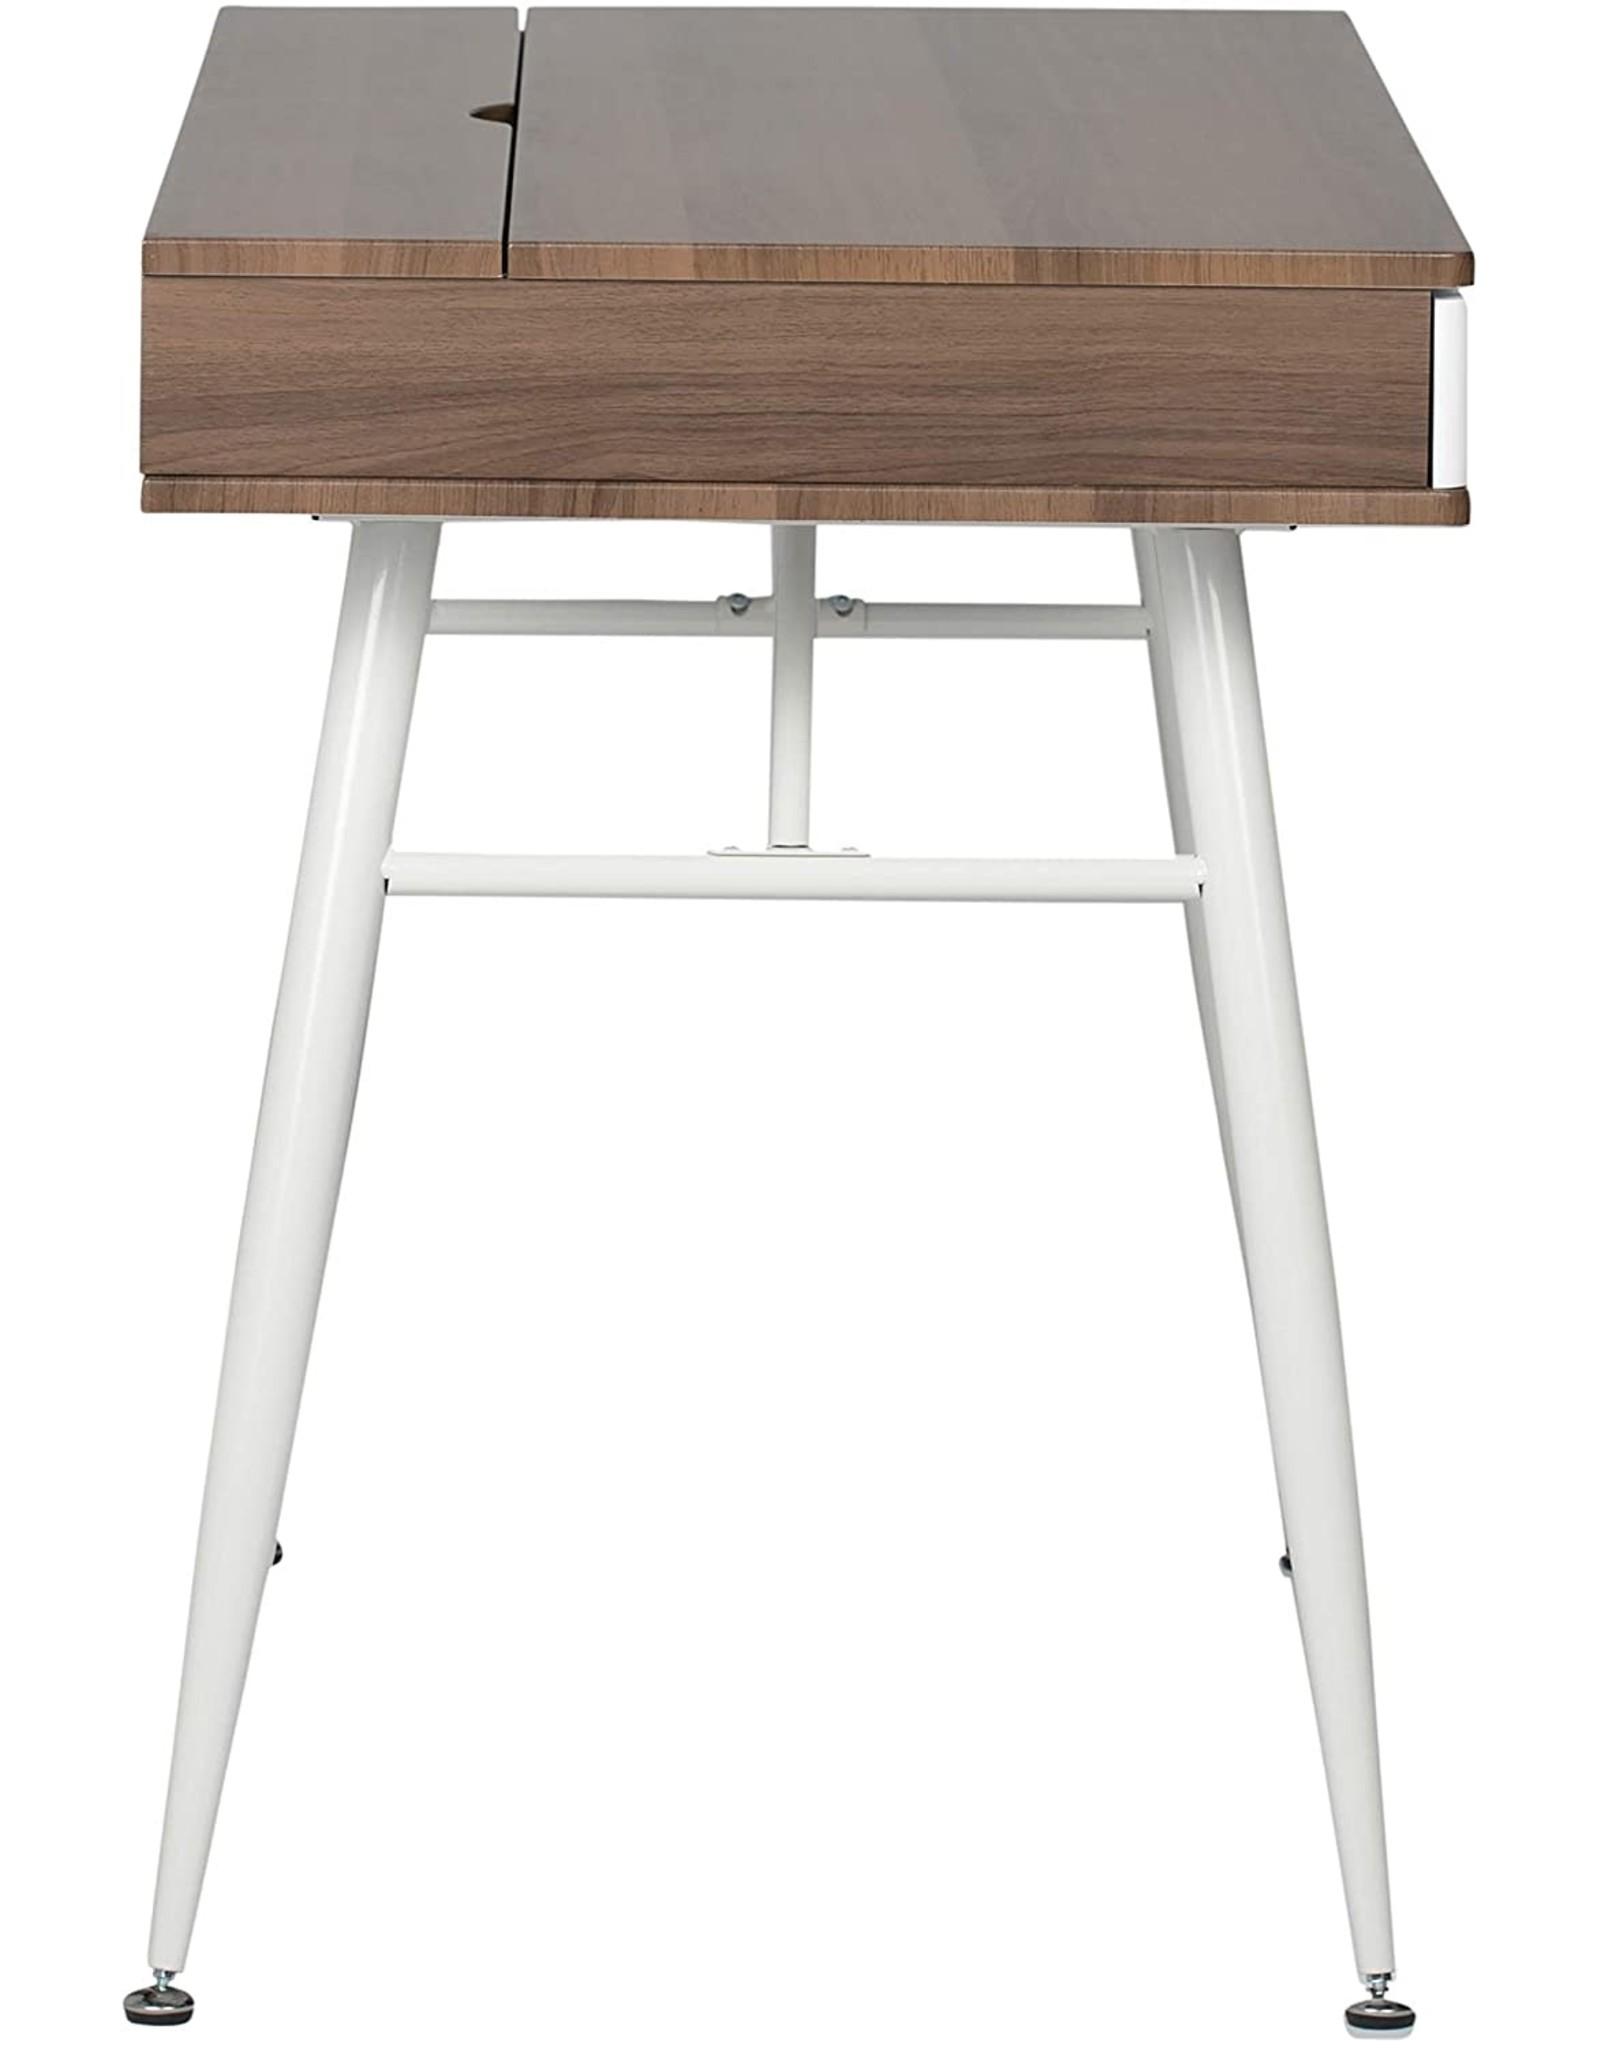 Calico Designs Calico Designs Alcove Modern Desk with Large Split Drawer Storage, White/Chestnut